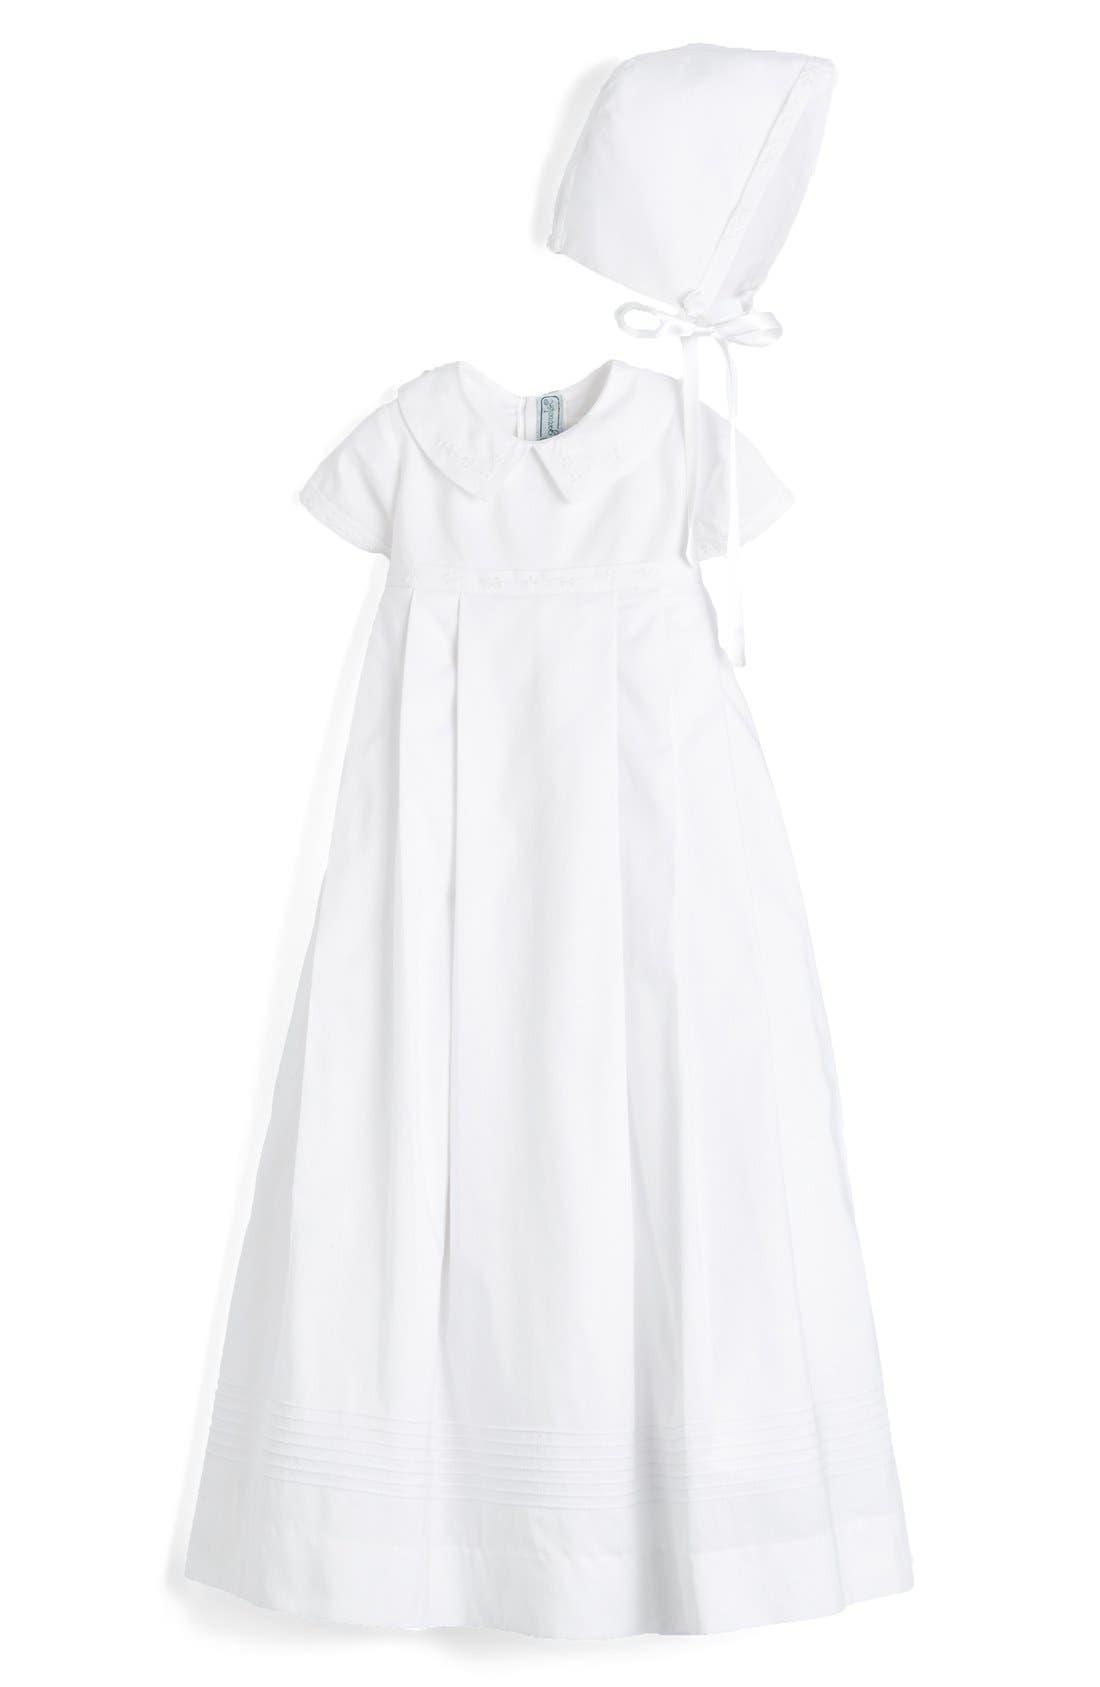 Main Image - Isabel Garreton 'Classic' Christening Gown & Bonnet (Baby)